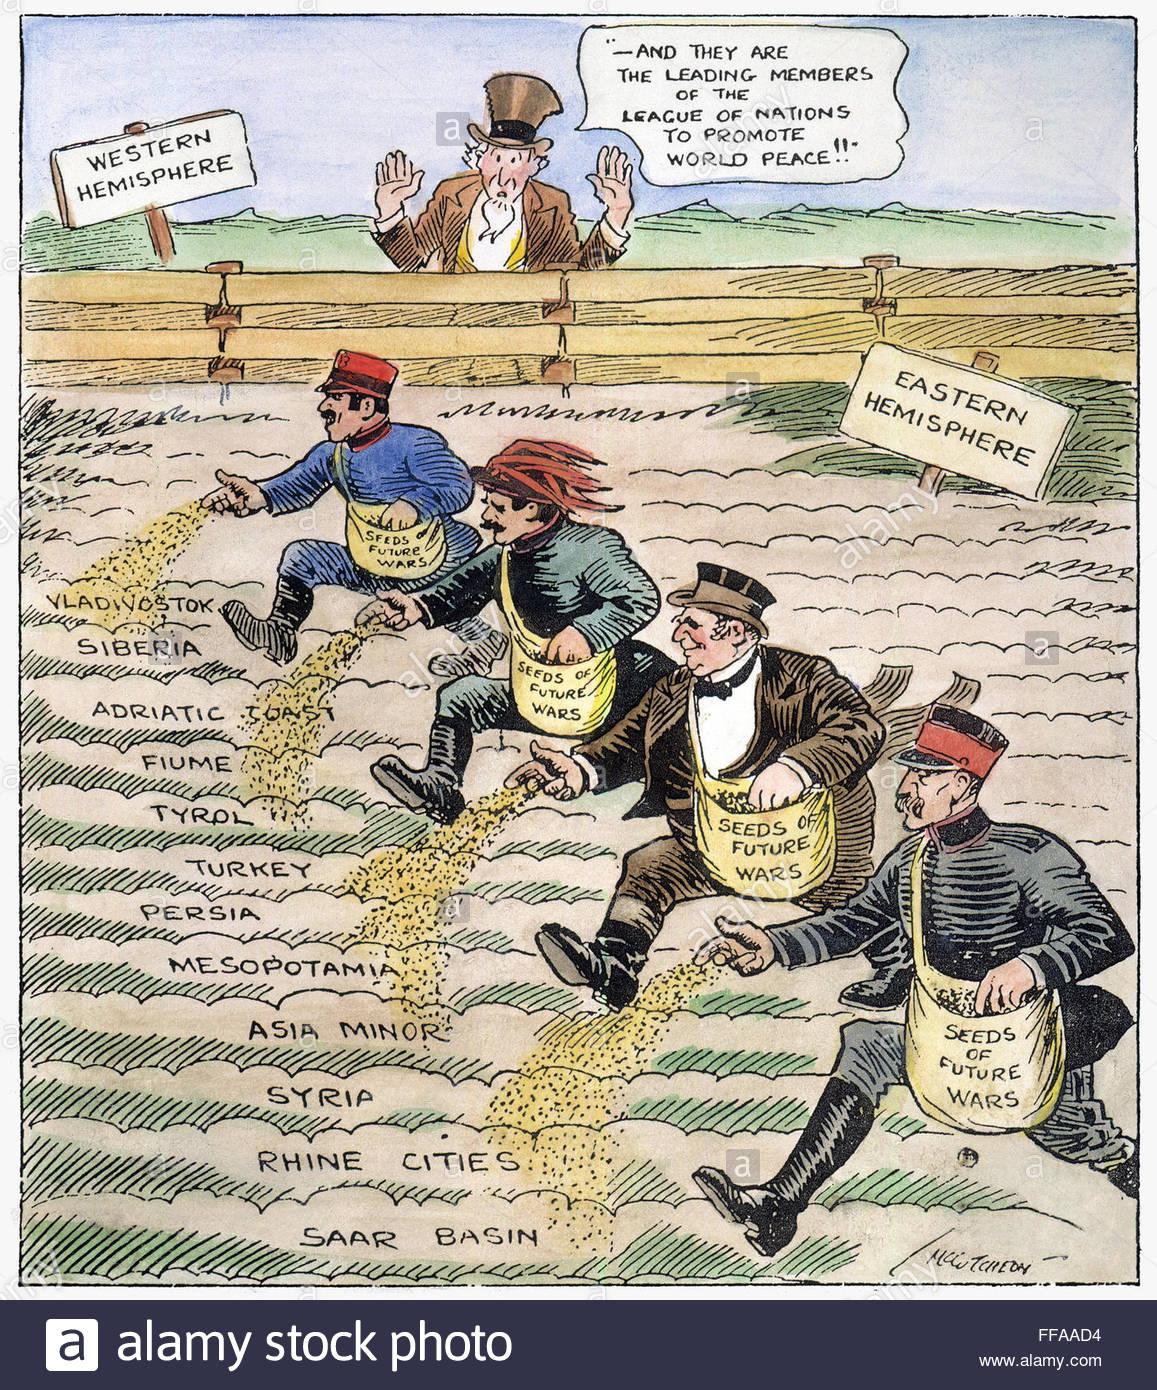 league-of-nations-cartoon-ncartoon-by-john-t-mccutcheon-for-the-chicago-FFAAD4